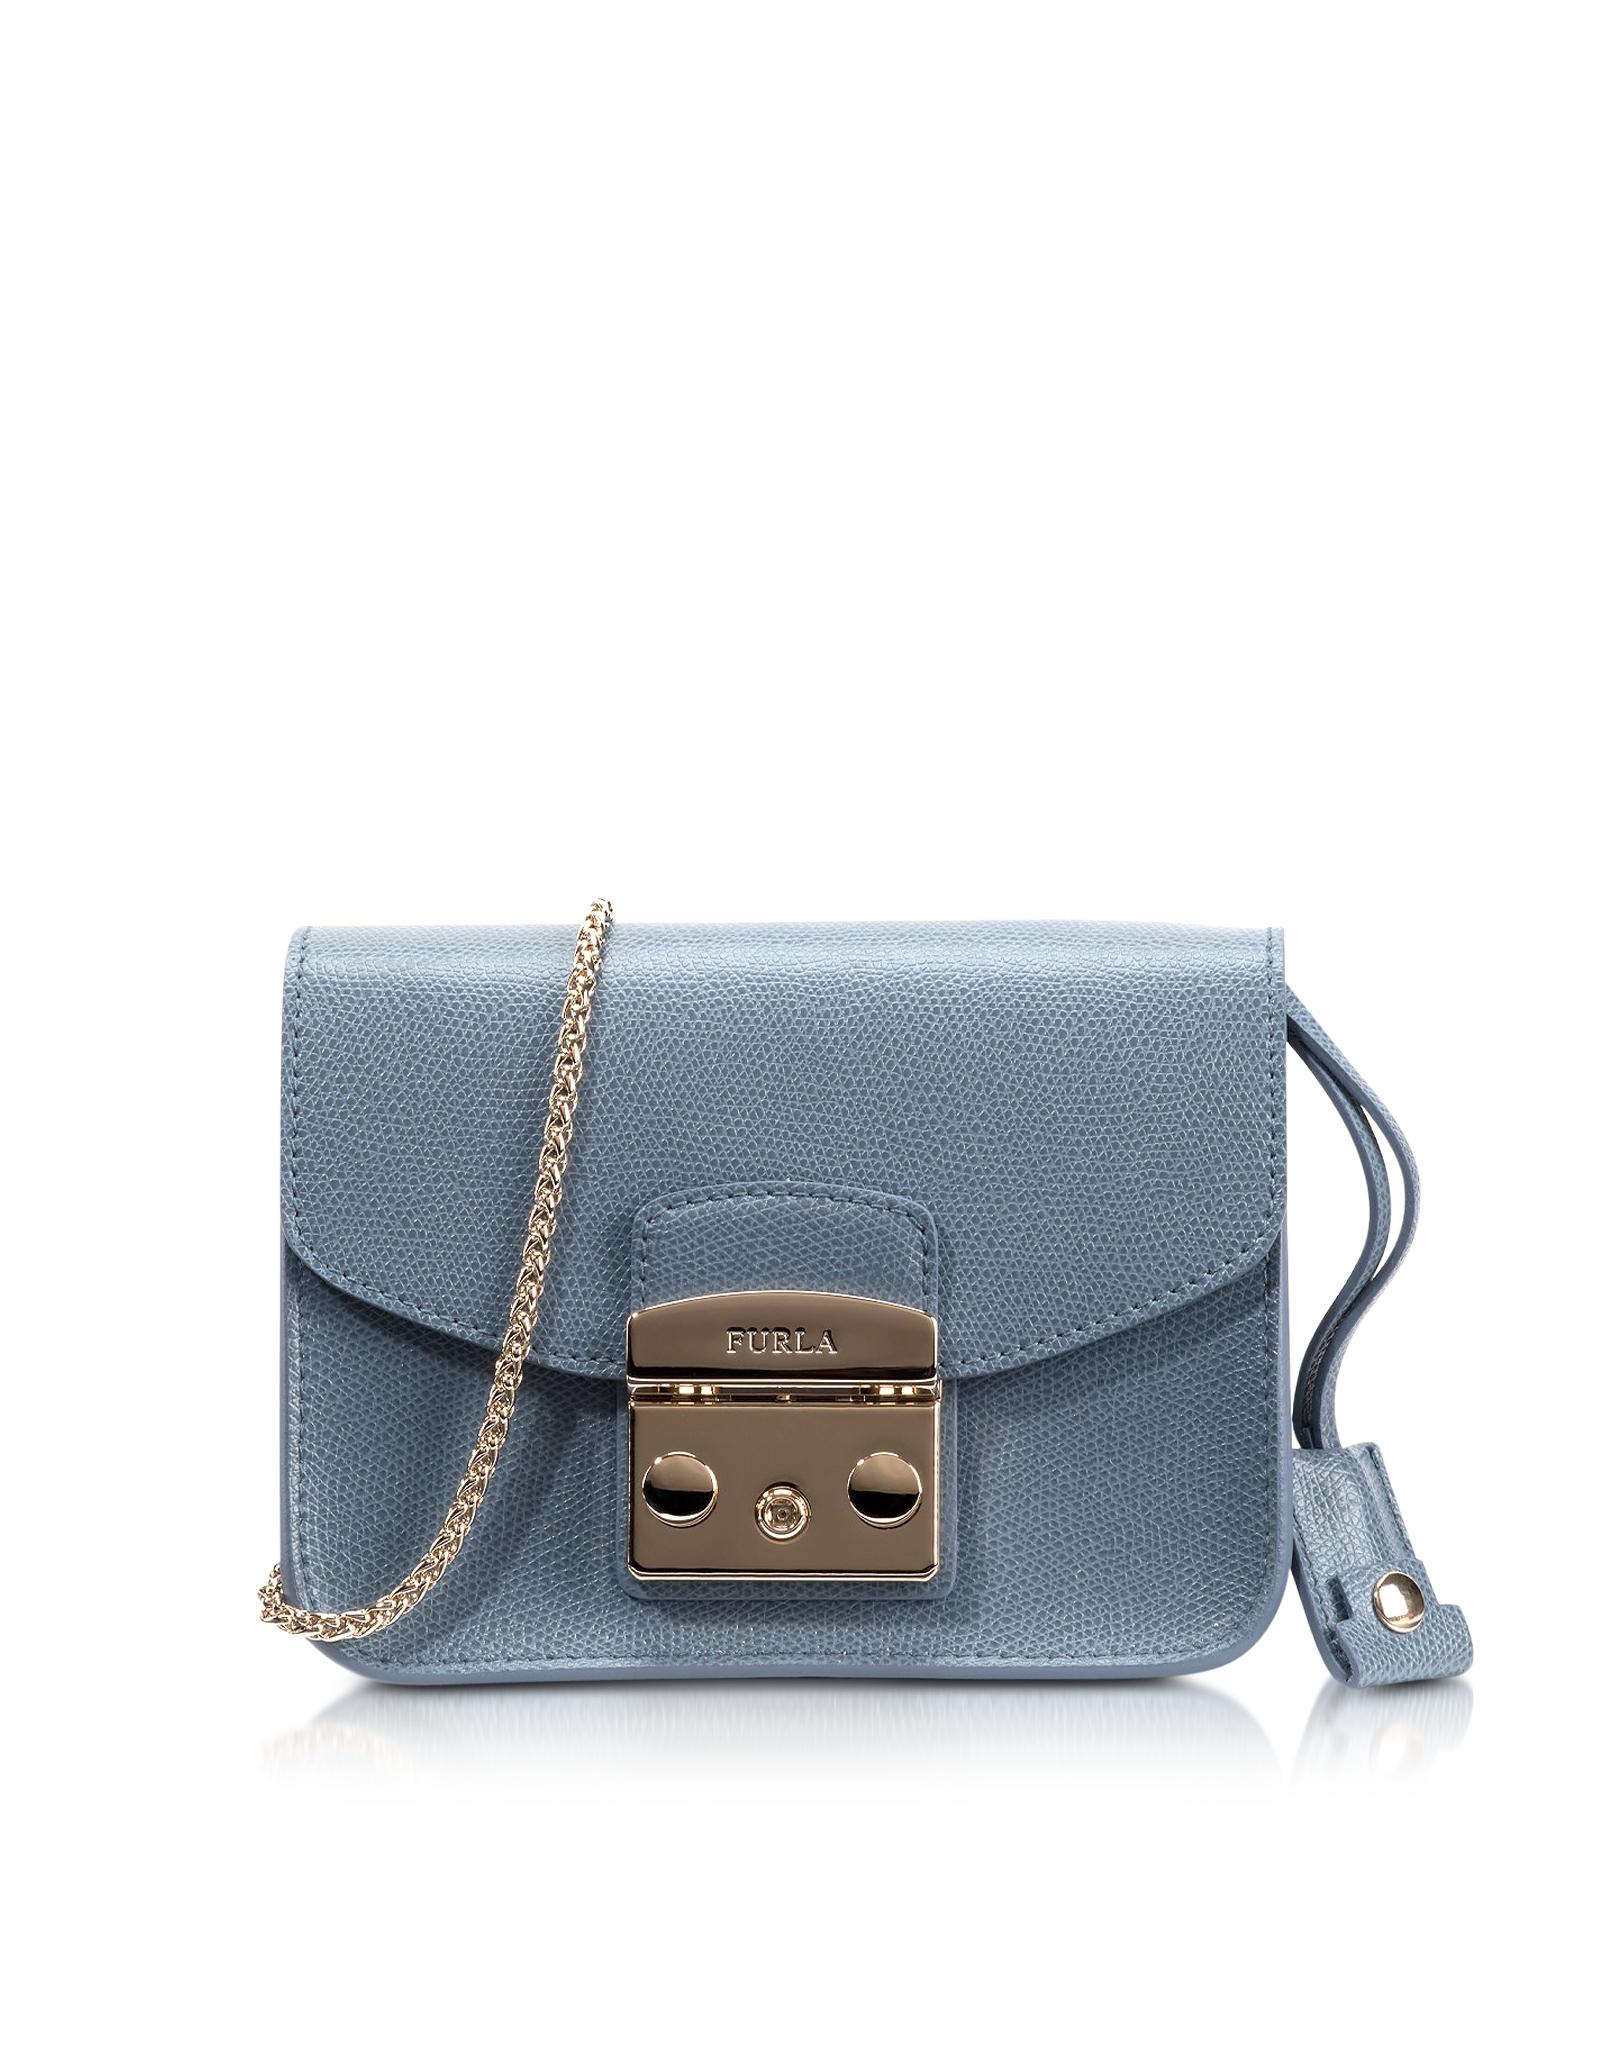 1d6dc8d40599f Lyst - Furla Metropolis Dolomia Leather Mini Crossbody Bag in Blue